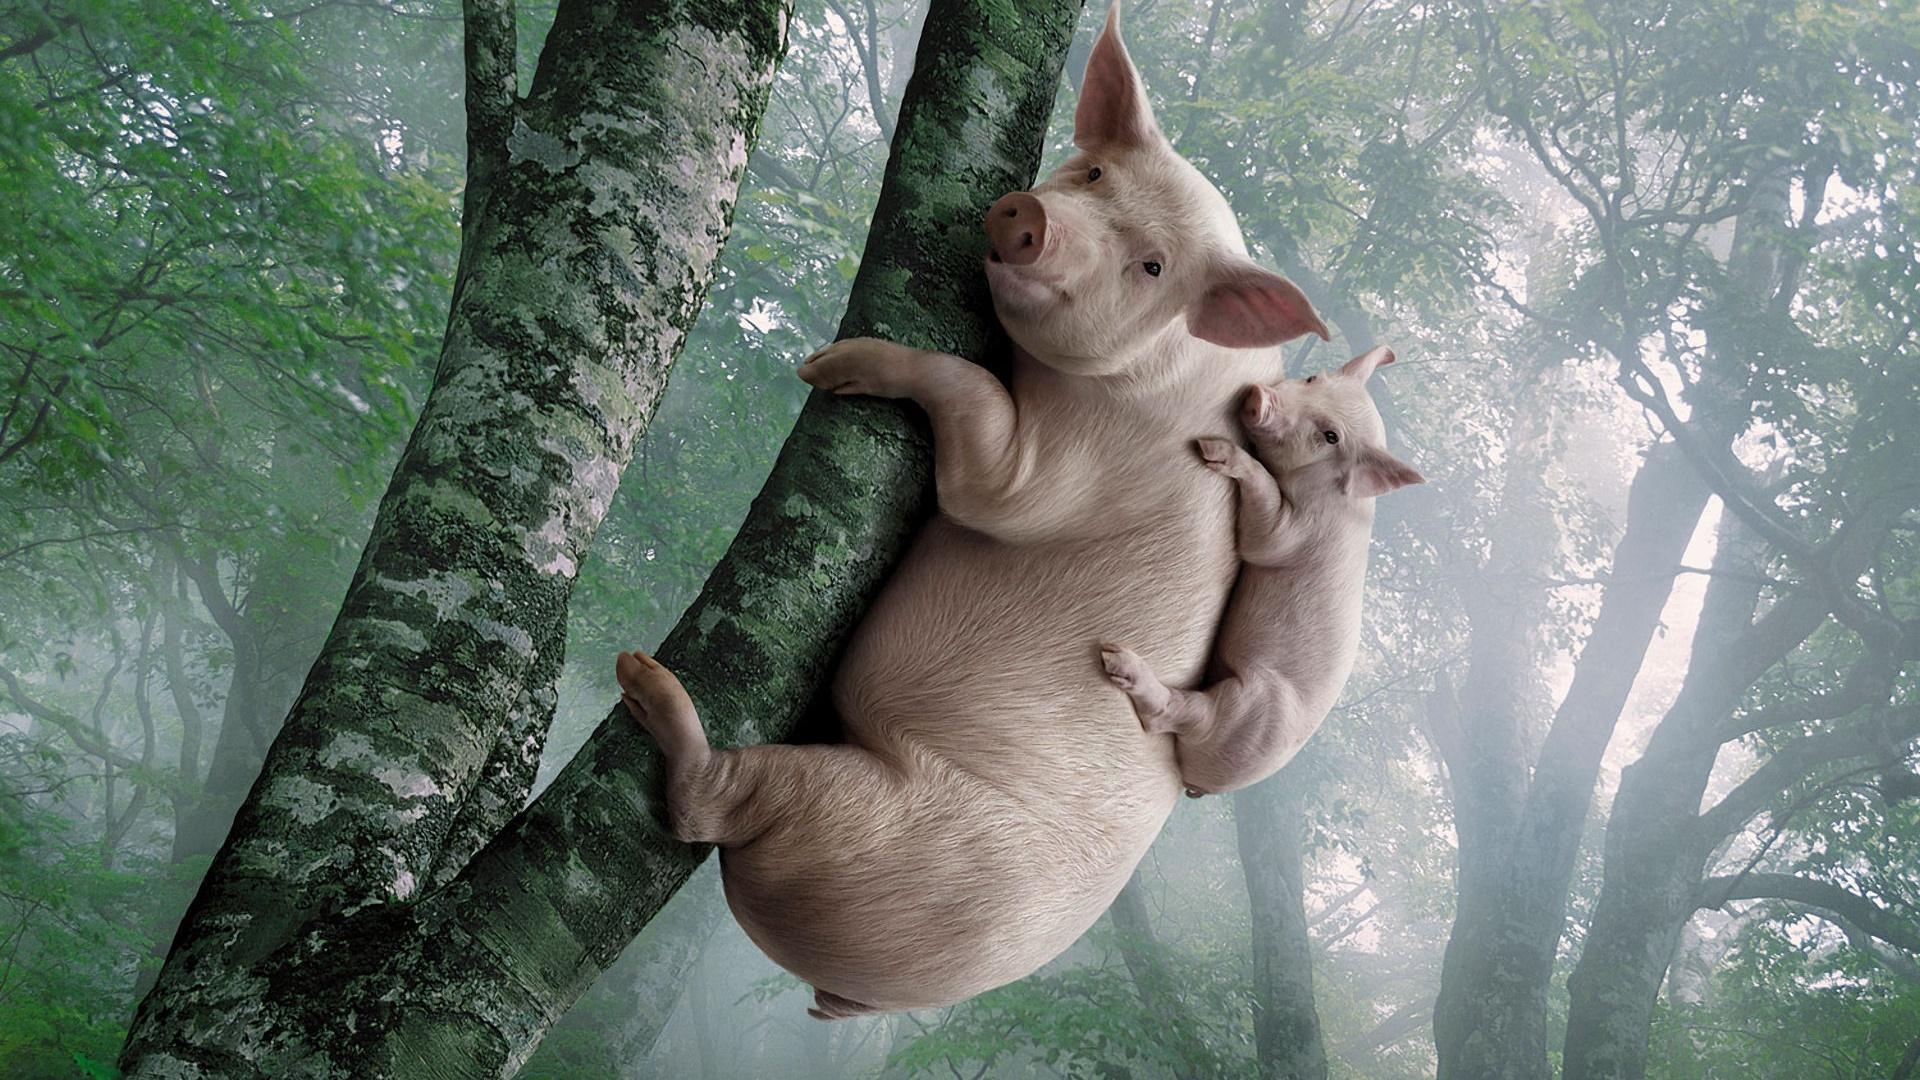 роспись рюкзака свинка пеппа и джордж